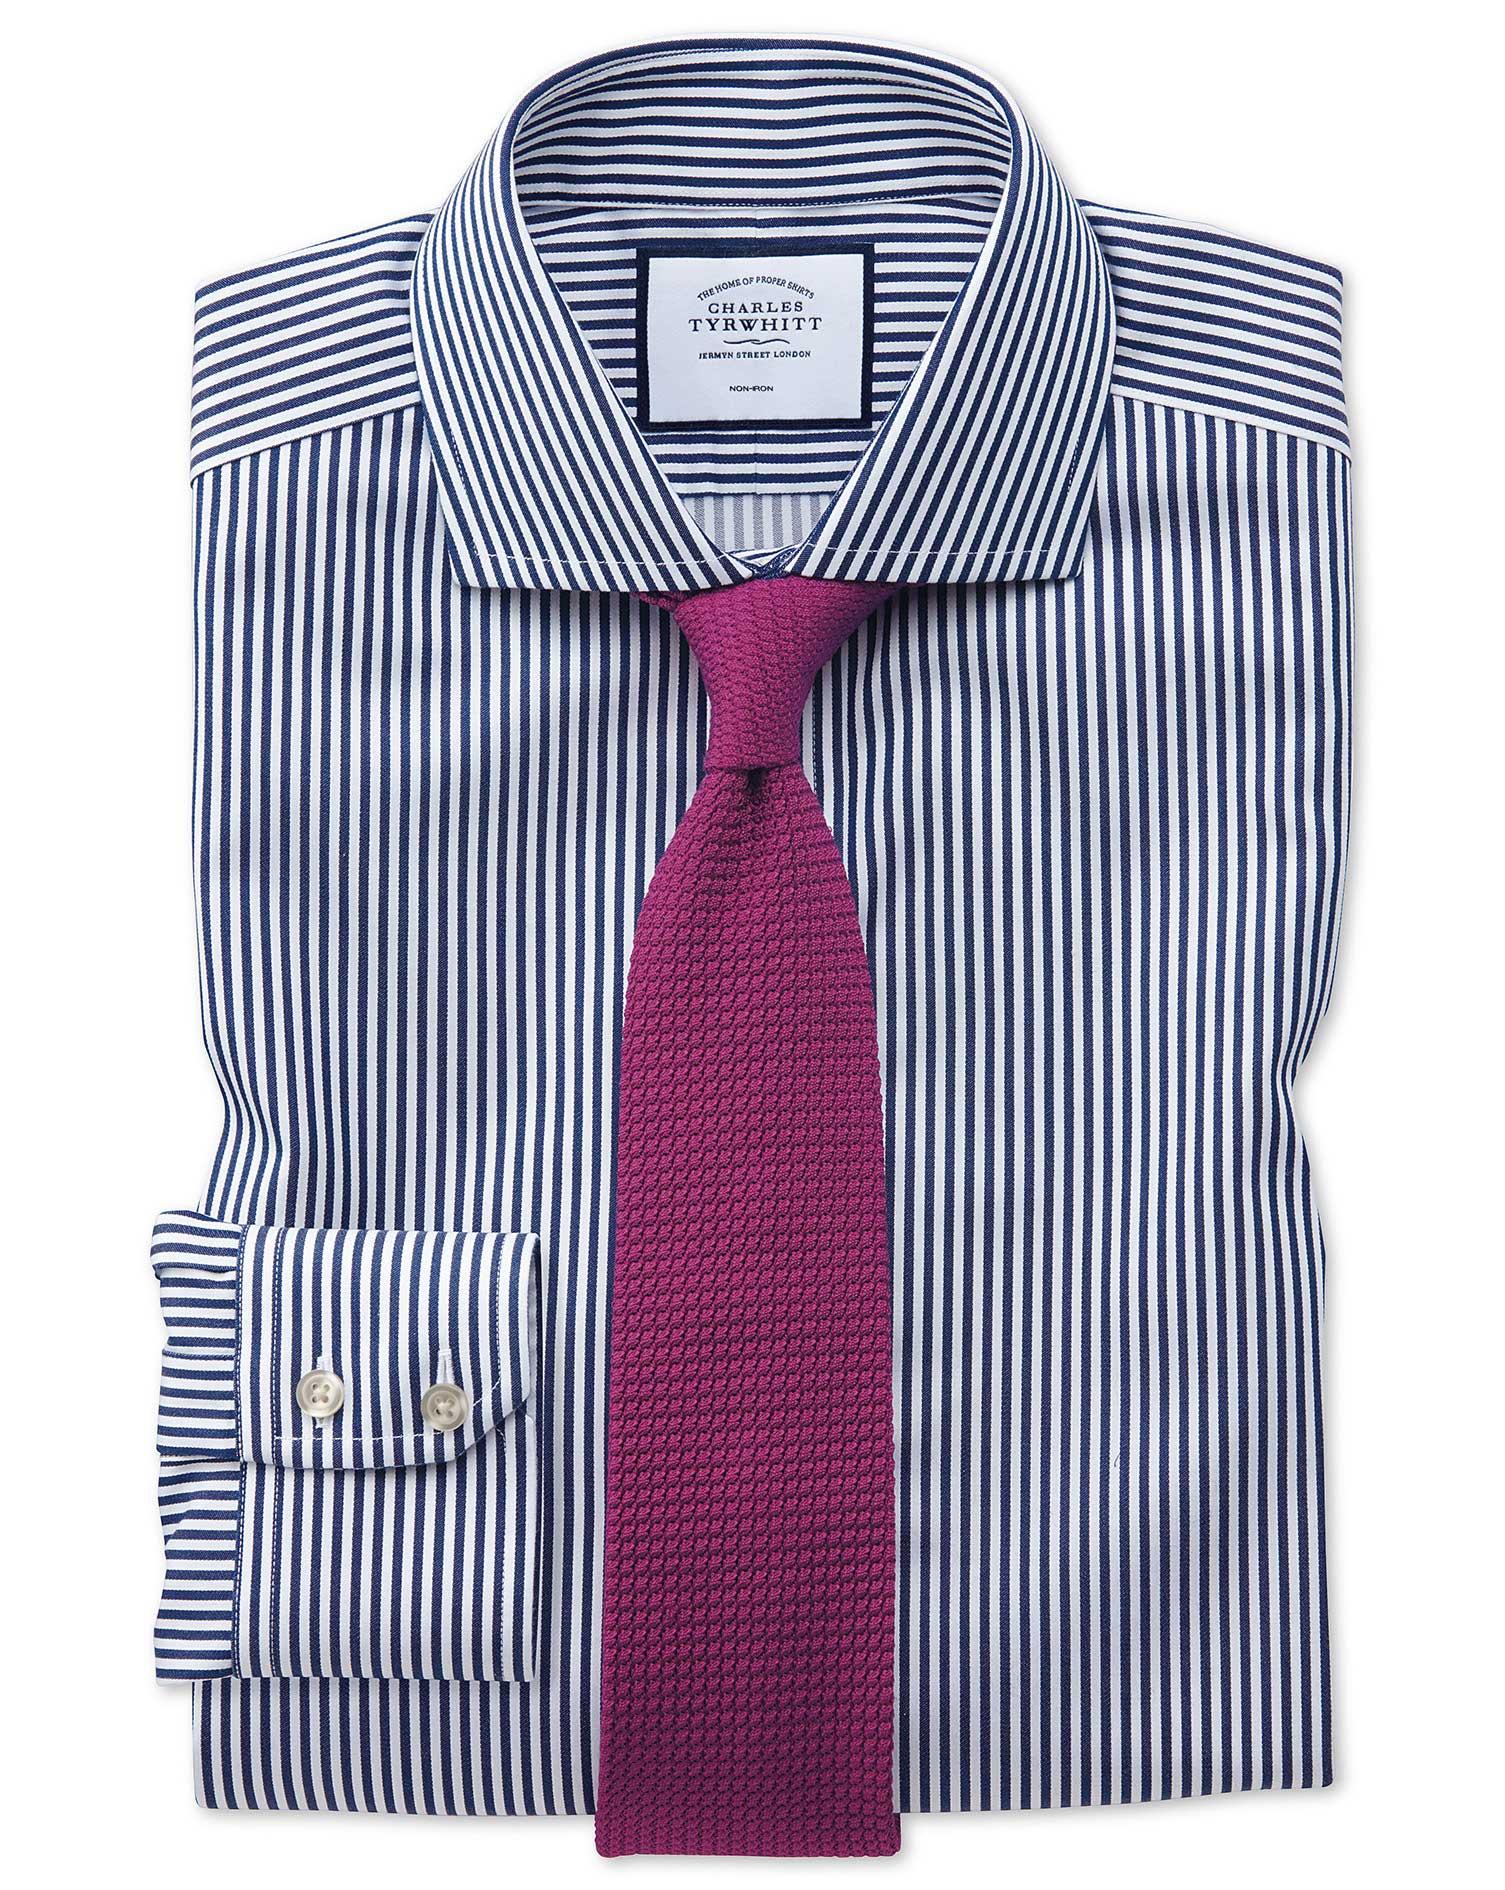 Extra Slim Fit Non-Iron Cutaway Collar Navy Twill Stripe Cotton Formal Shirt Single Cuff Size 16.5/3